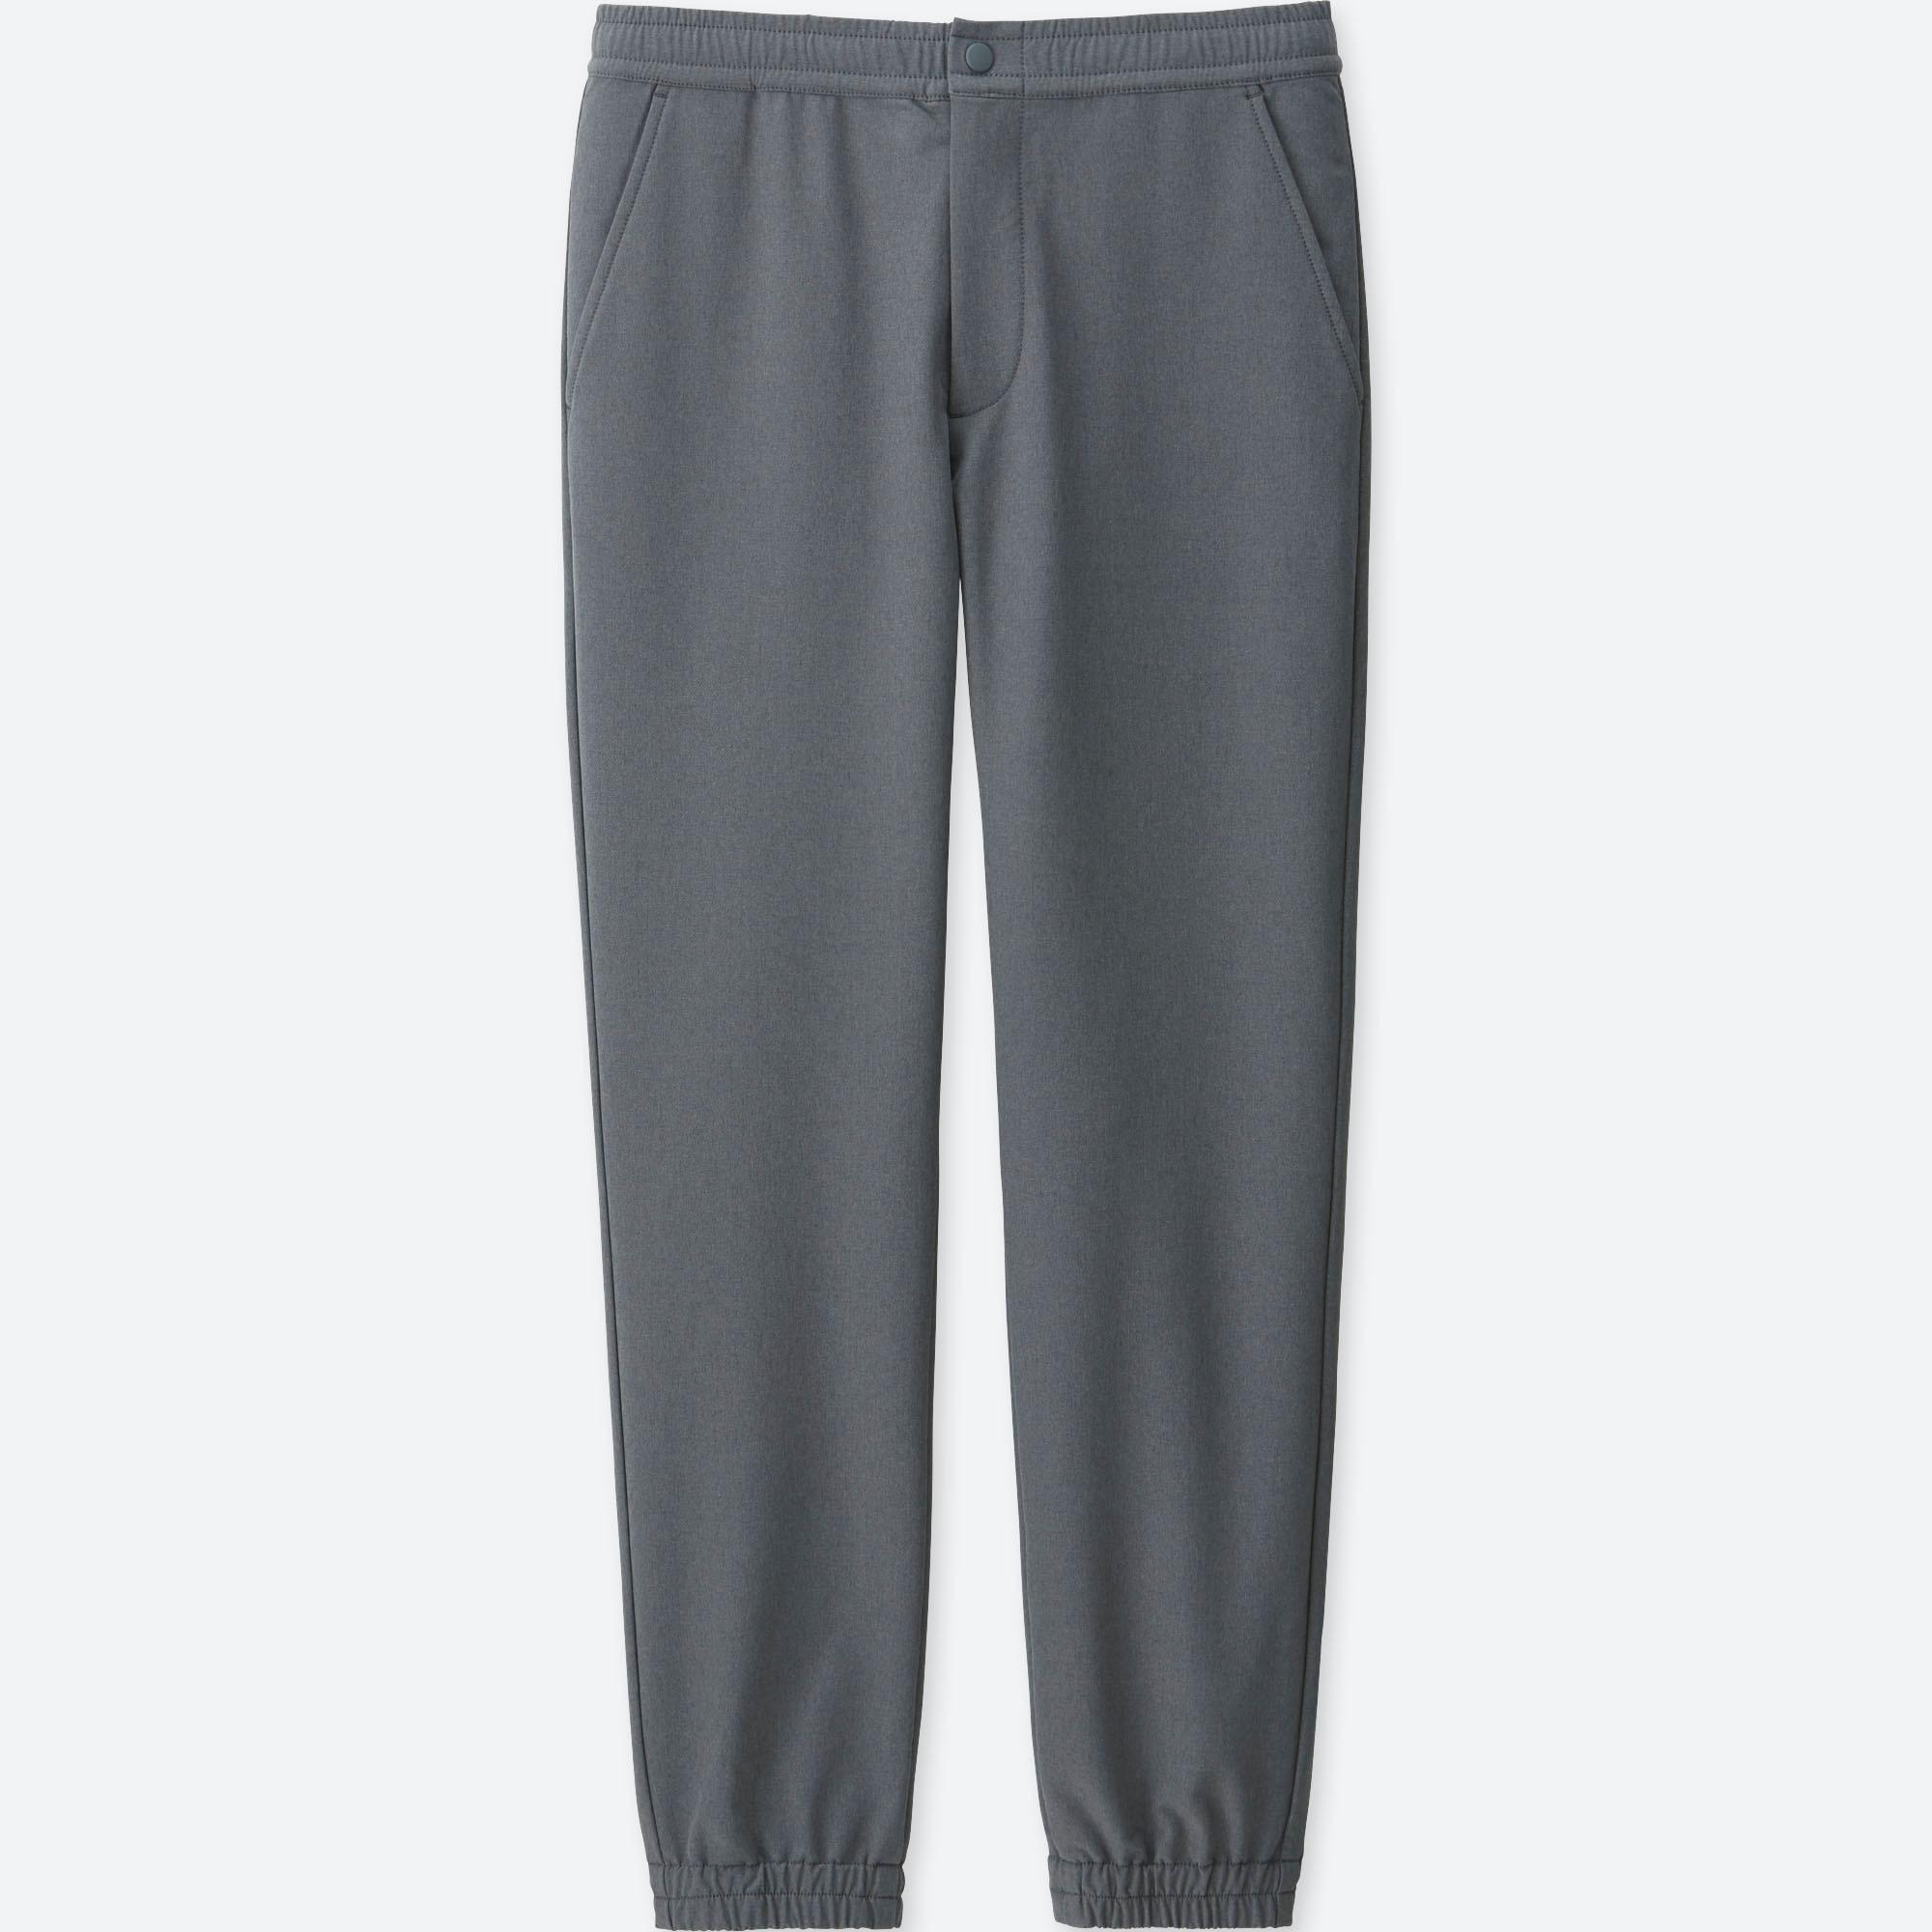 NEW T-pshop Sizes 4-10 Check Joggers Pyjama Trousers Sleepwear Loungewear